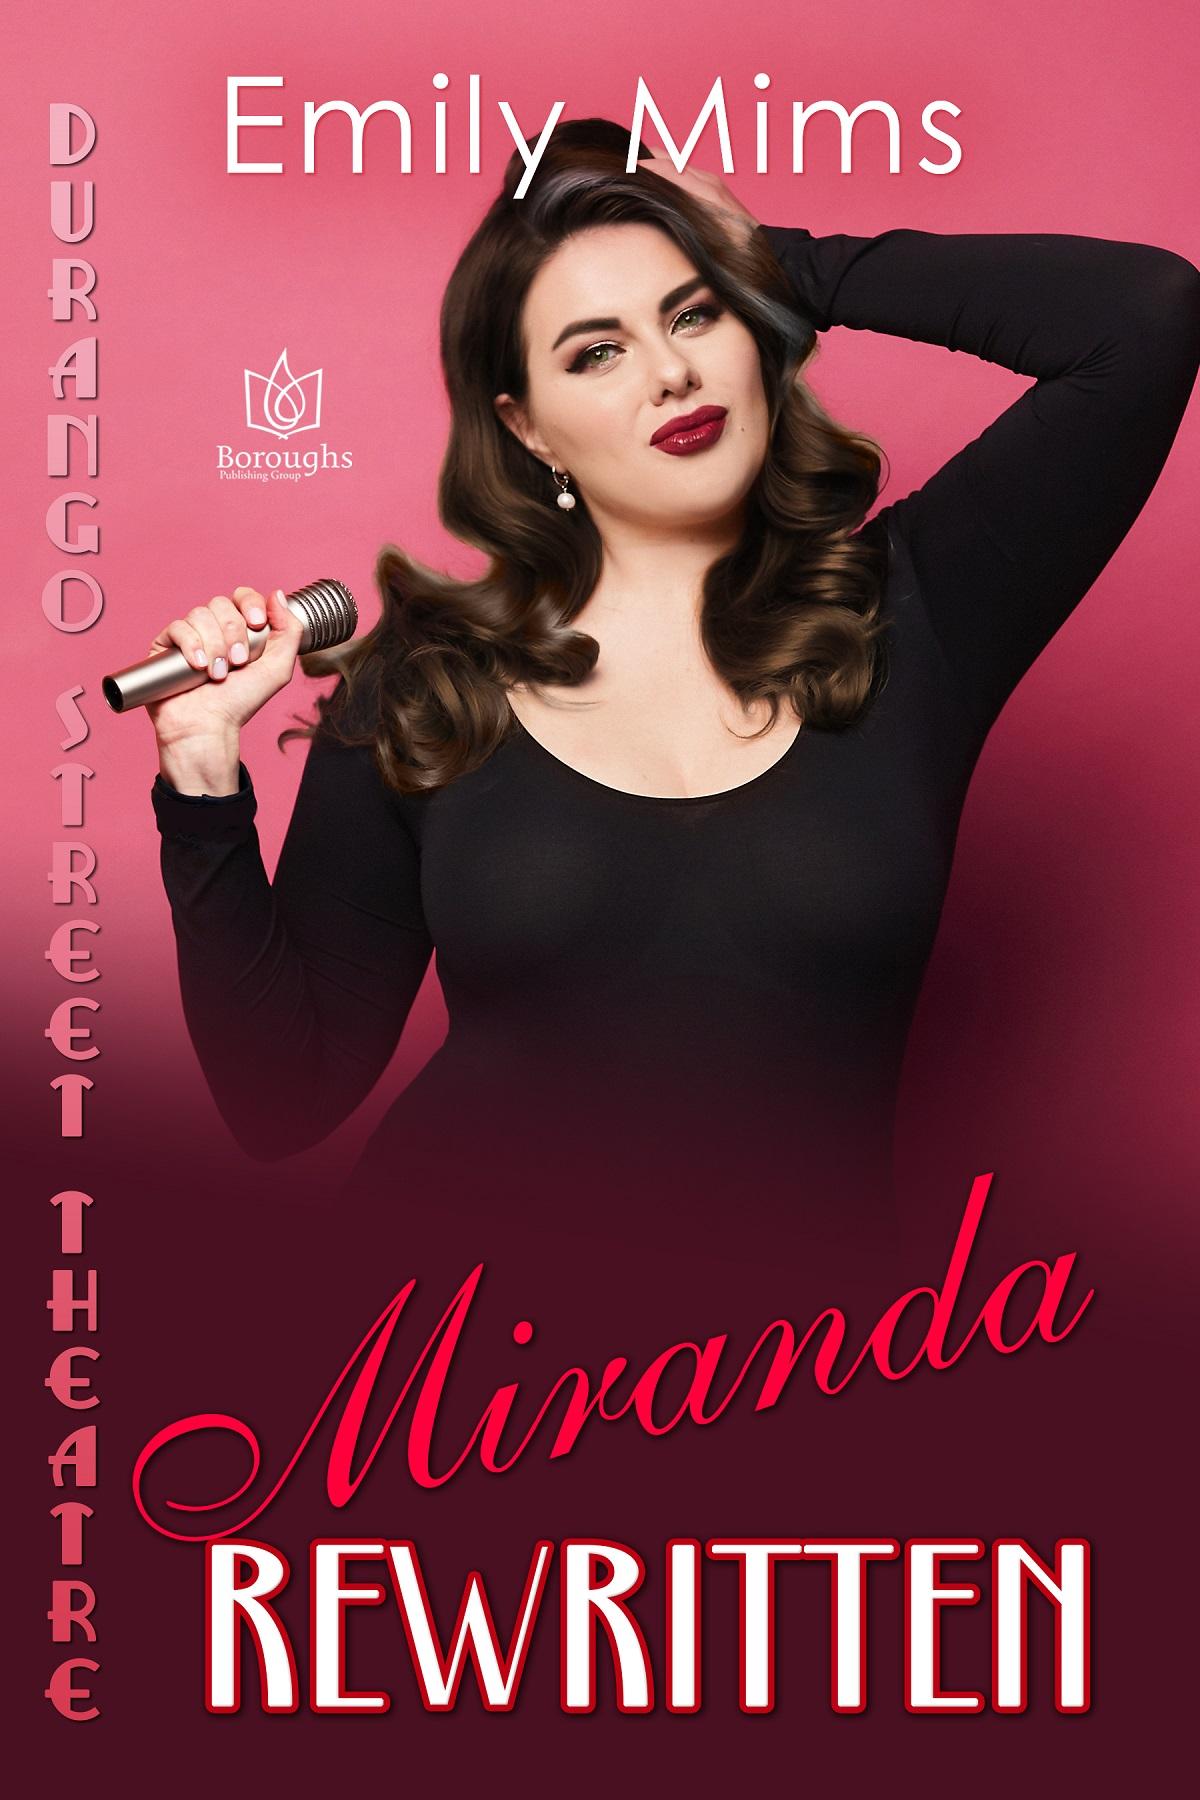 Miranda Rewritten cover